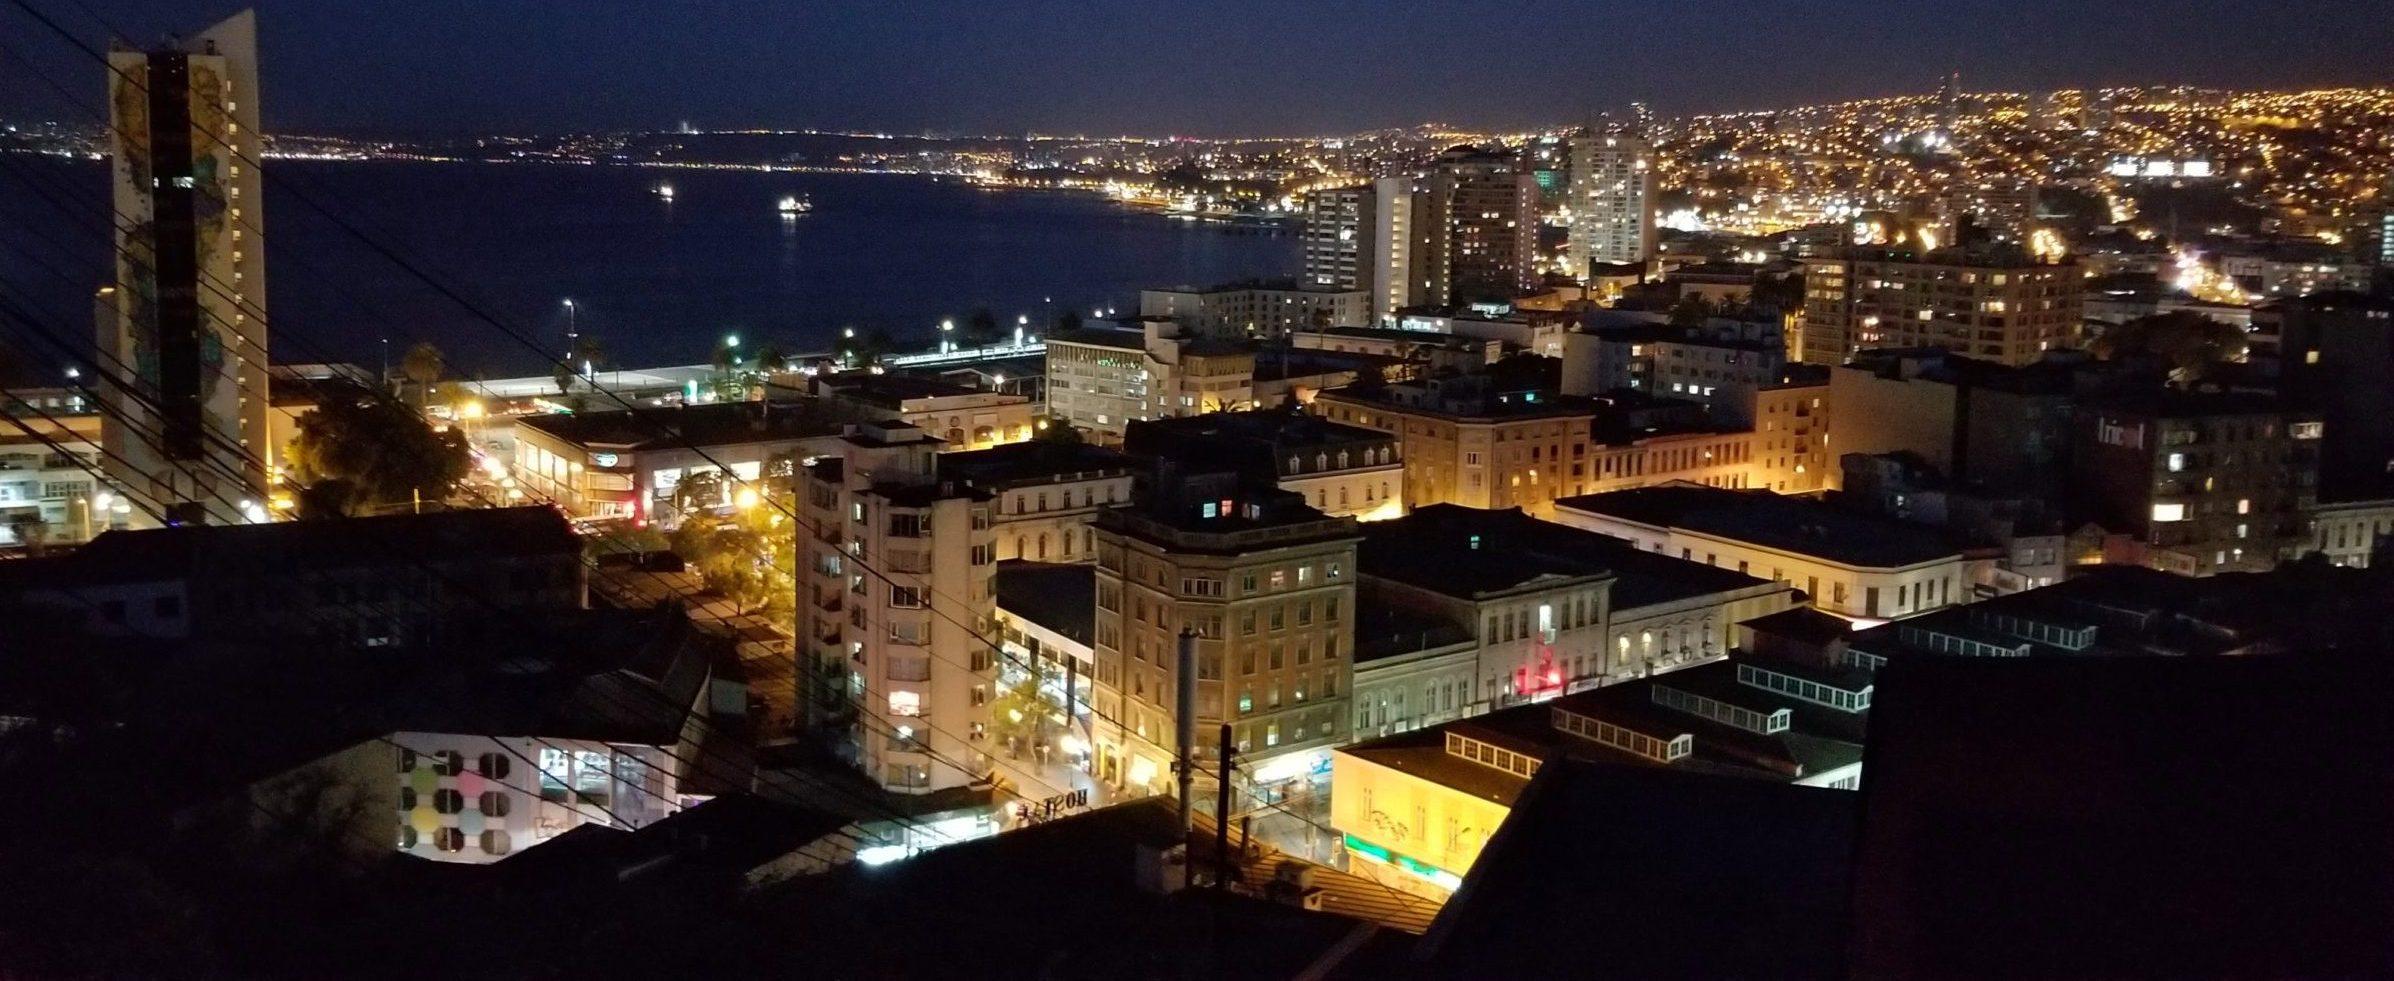 That's Valparaiso